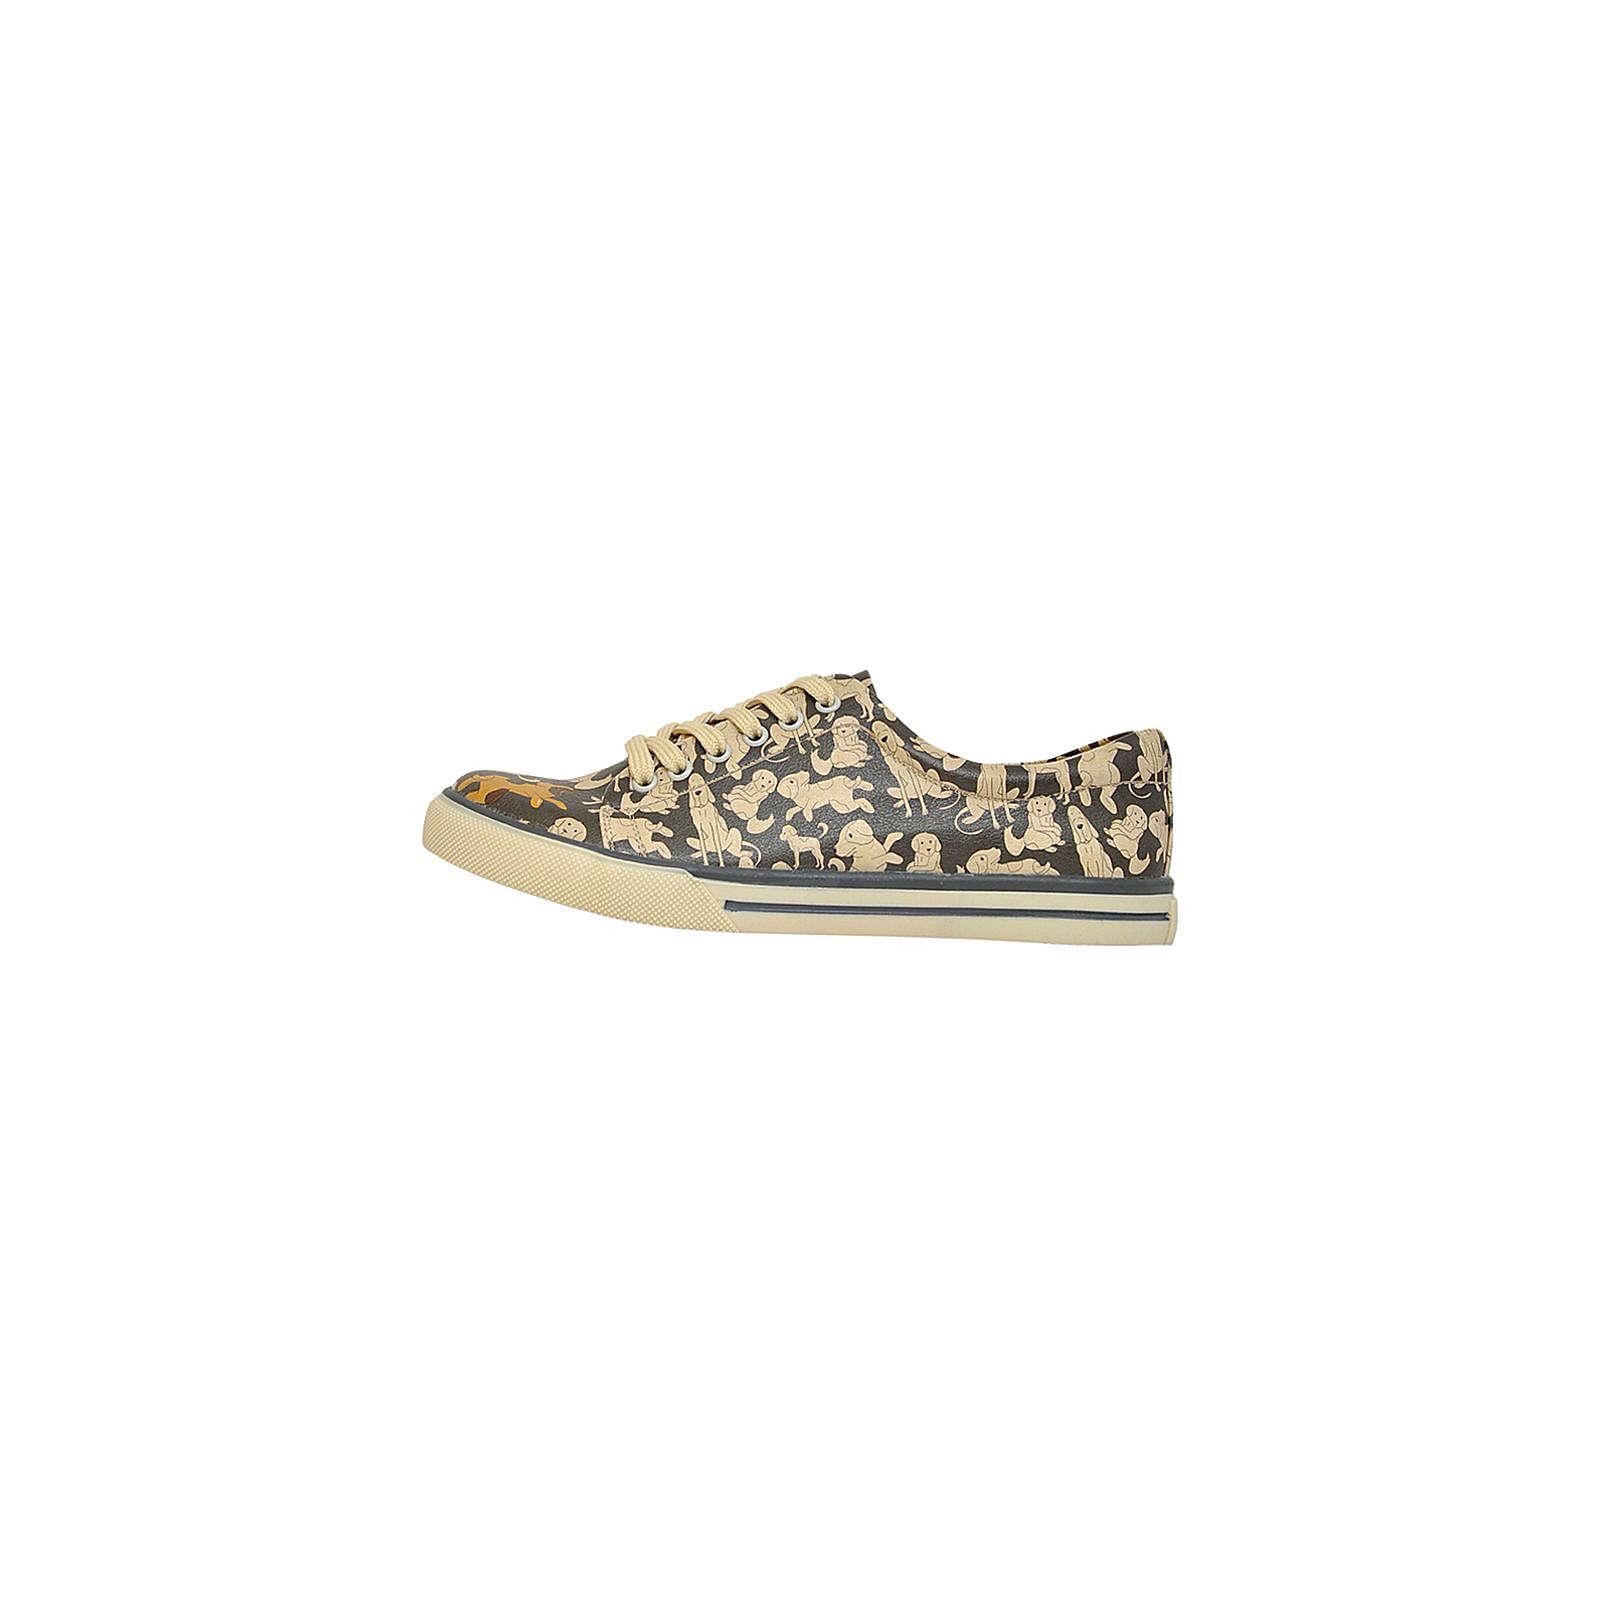 Dogo Shoes Sneakers Low It´s Raining Dogs mehrfarbig Damen Gr. 37